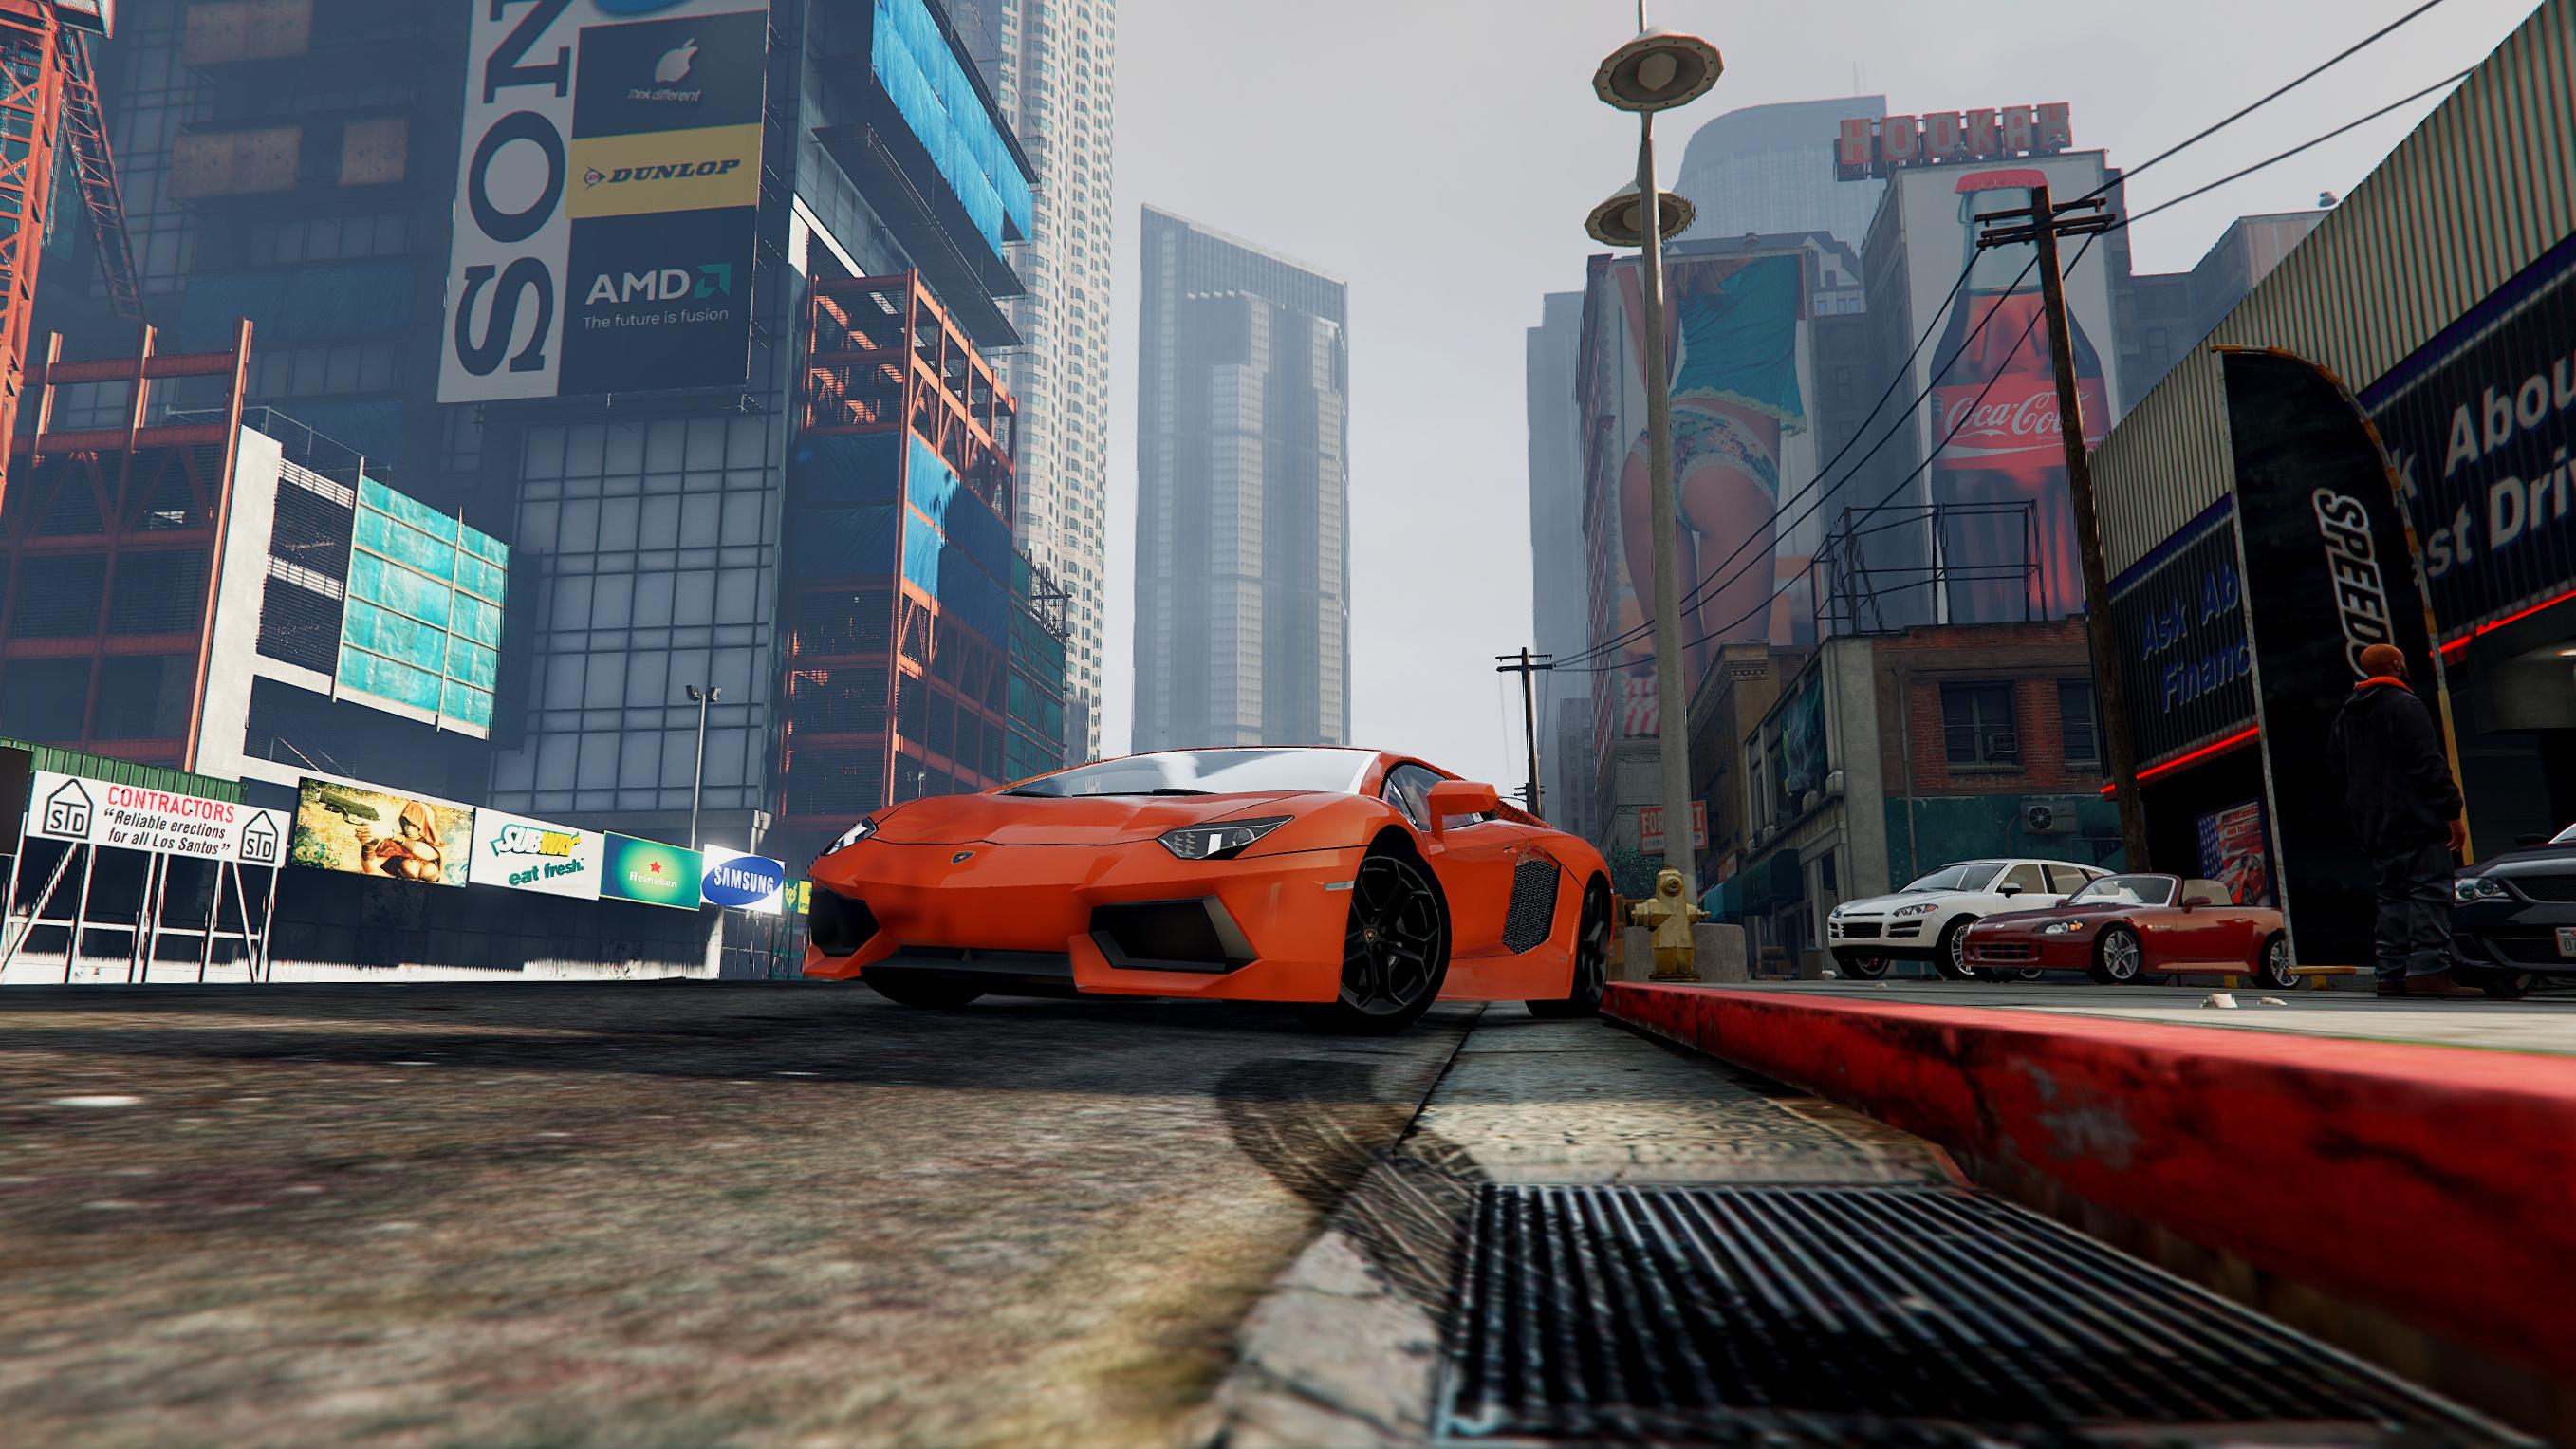 Real Billboards / Werbeplakate [OIV] - GTA5-Mods com